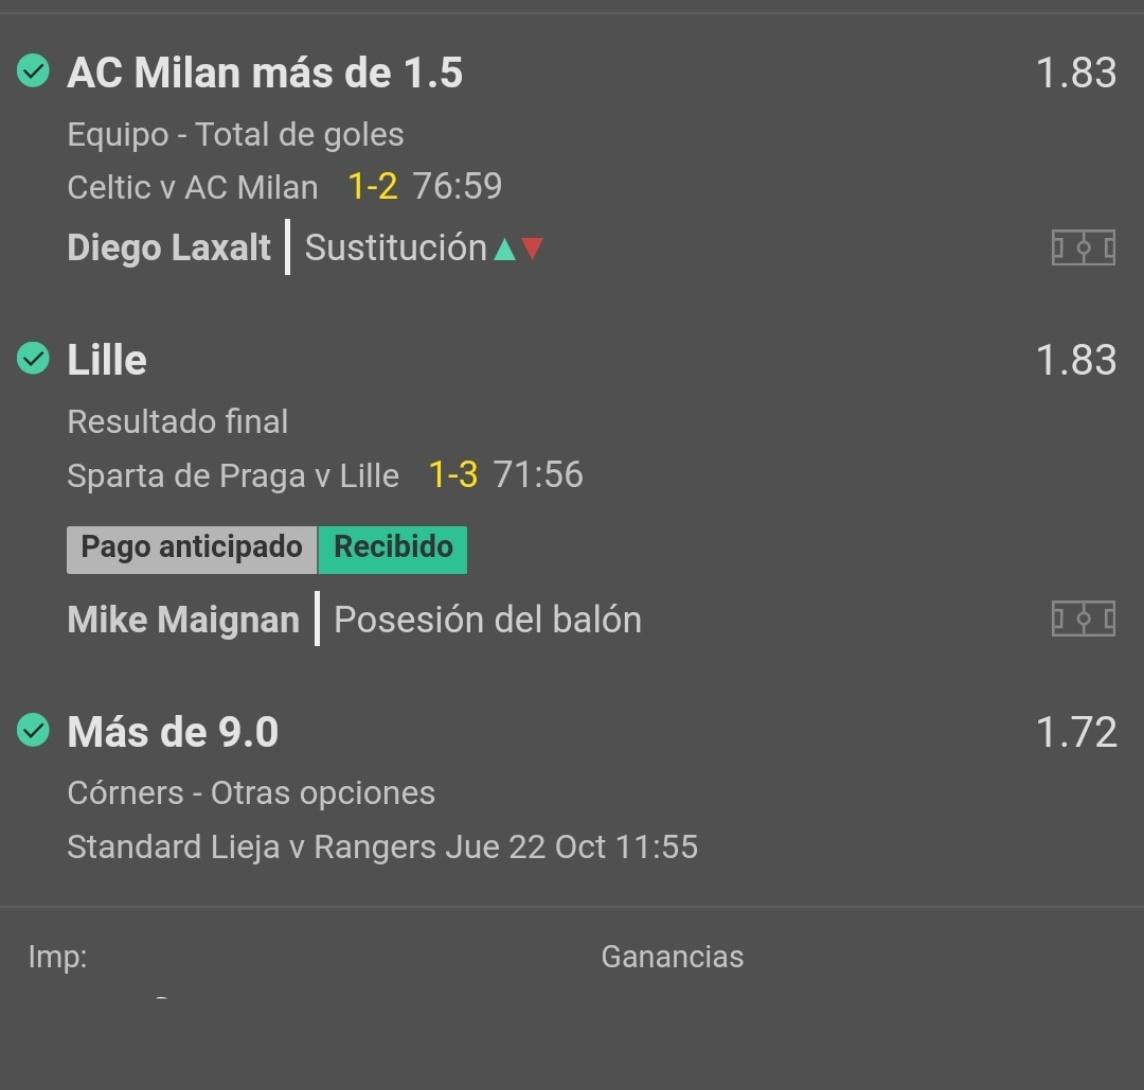 Se cobran las 3 jugadas enviadas para #EuroLeague  📍Celtic vs Milan  📌Milan mas de 1 gol (1.83) 2%✅💰  📍Sparta vs Lille  📌Lille ML (1.83) 1.5%✅💰  📍Standard L vs Rangers  📌Mas de 9 corners (1.72) 1.5 %✅💰 https://t.co/bsmPbOedSQ